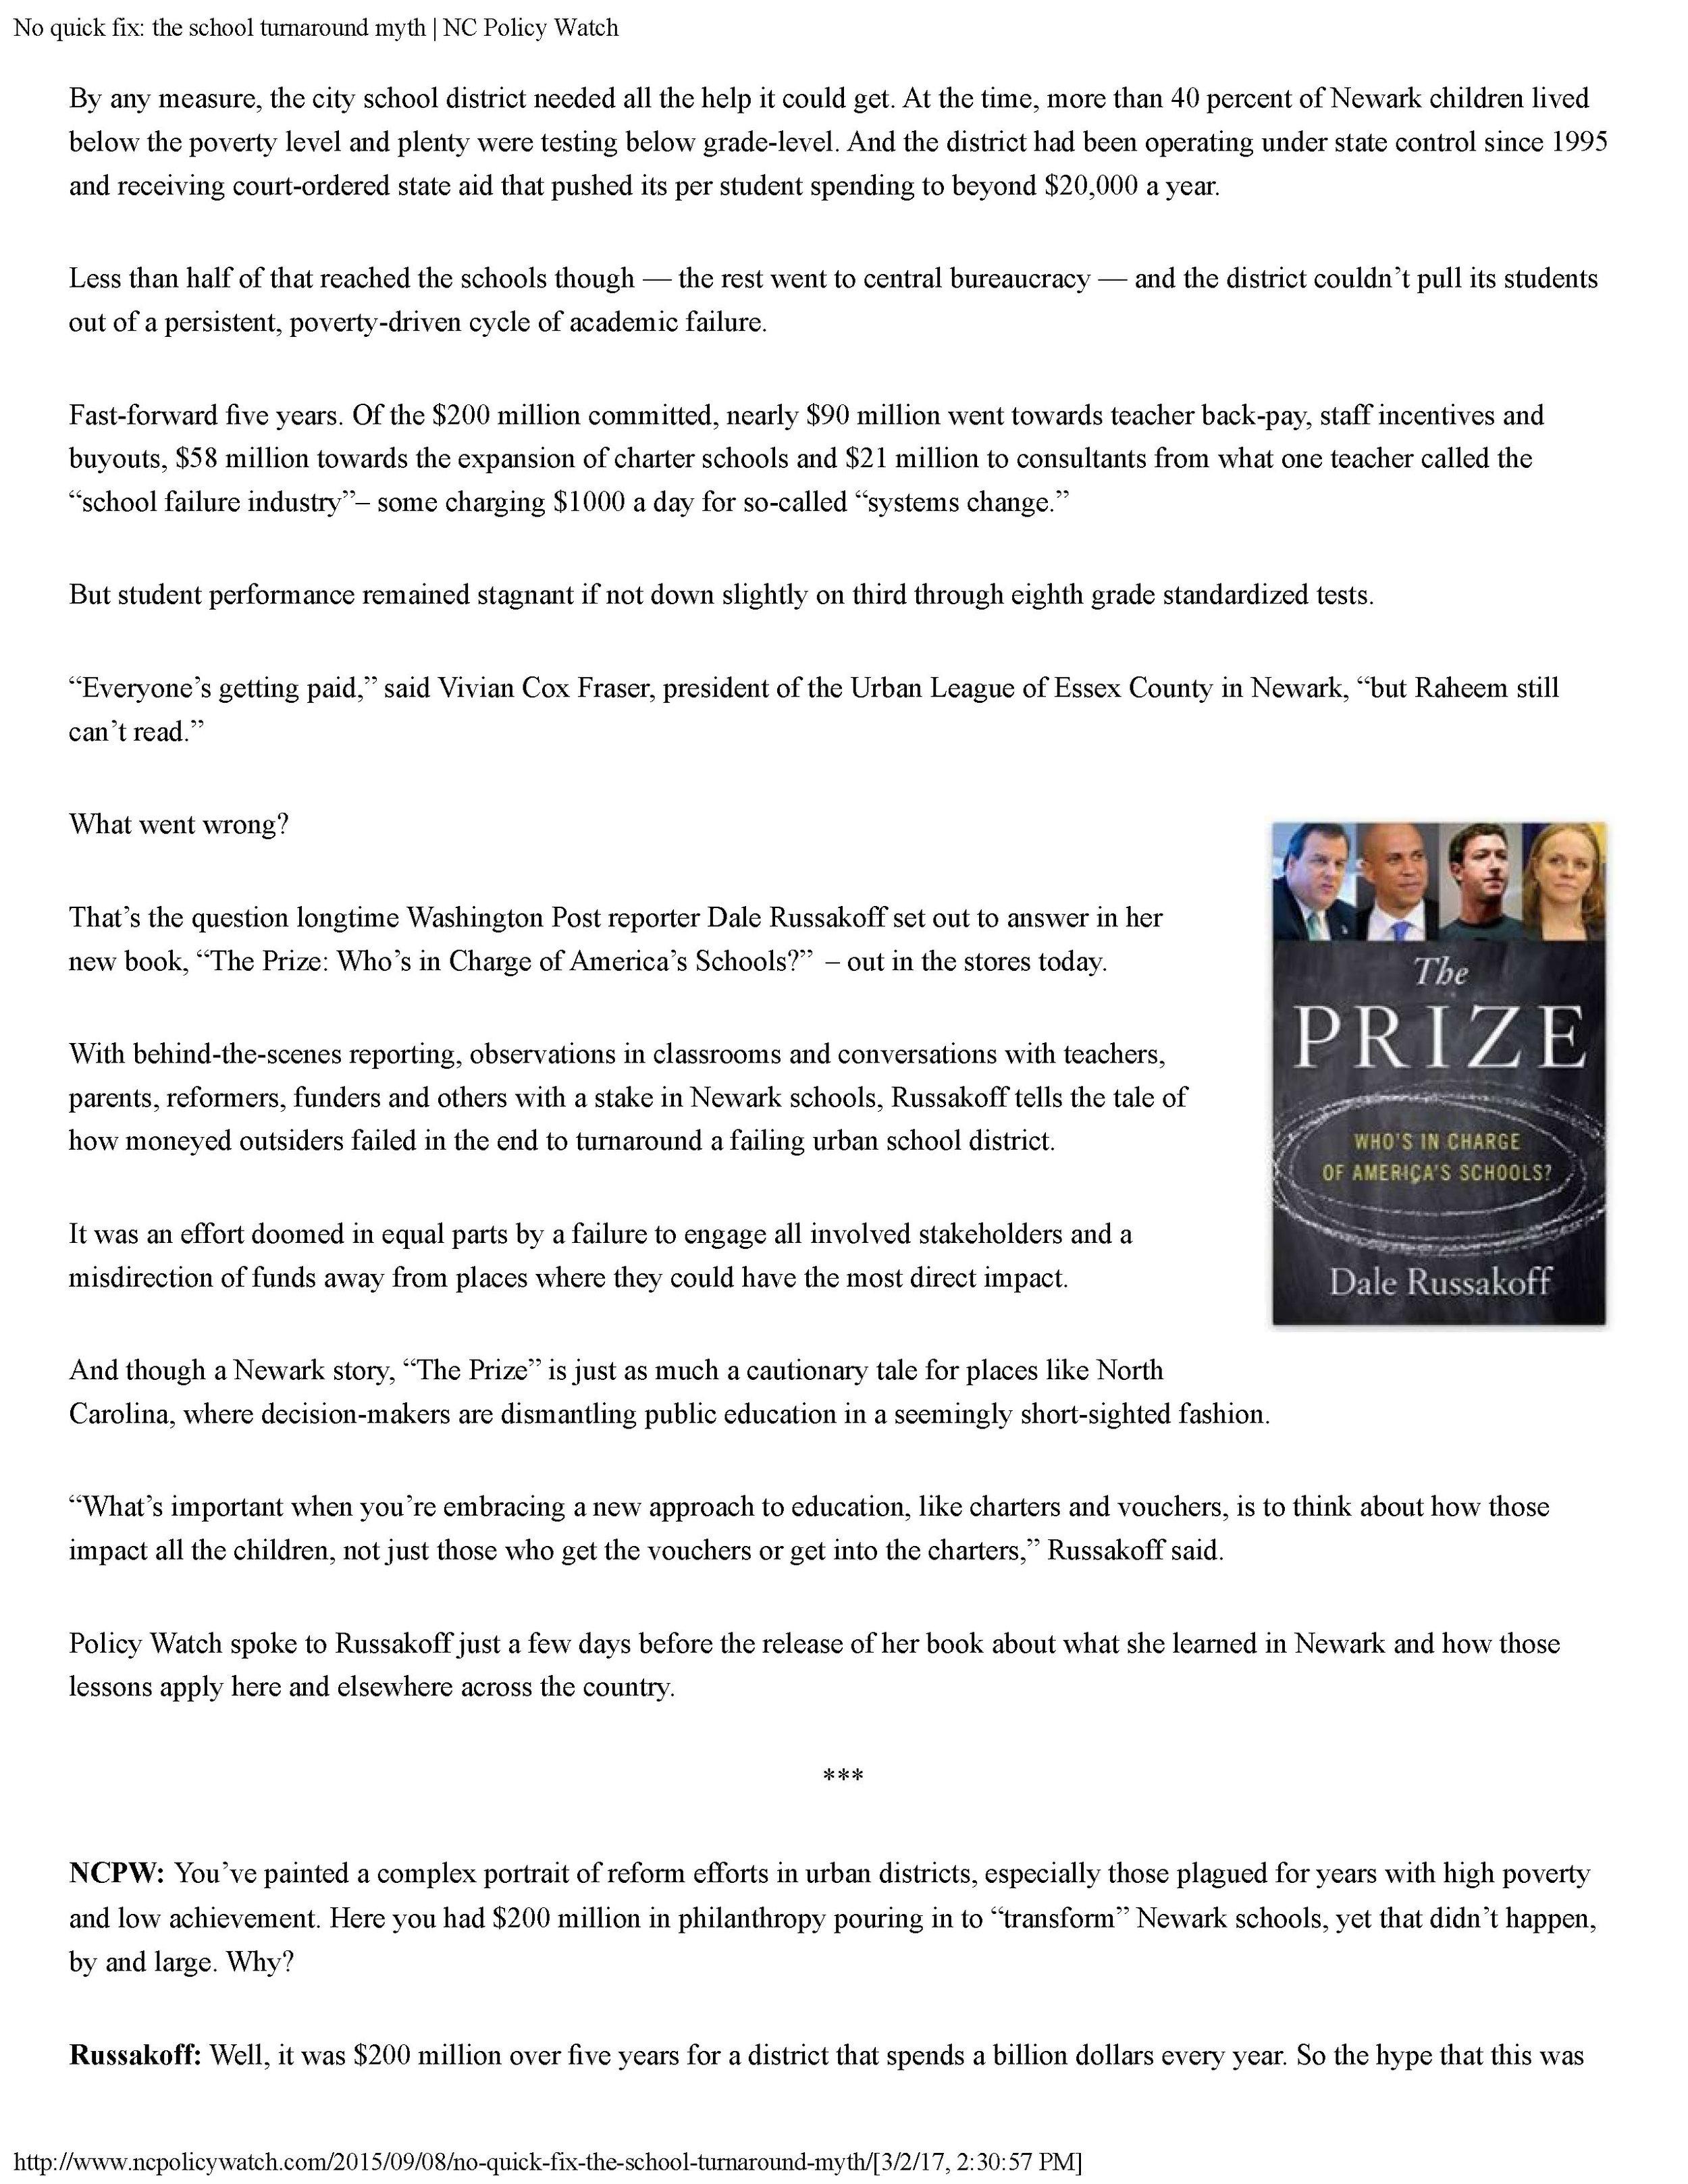 Sharon McCloskey - No quick fix- the school turnaround myth - NC Policy Watch_Page_2.jpg